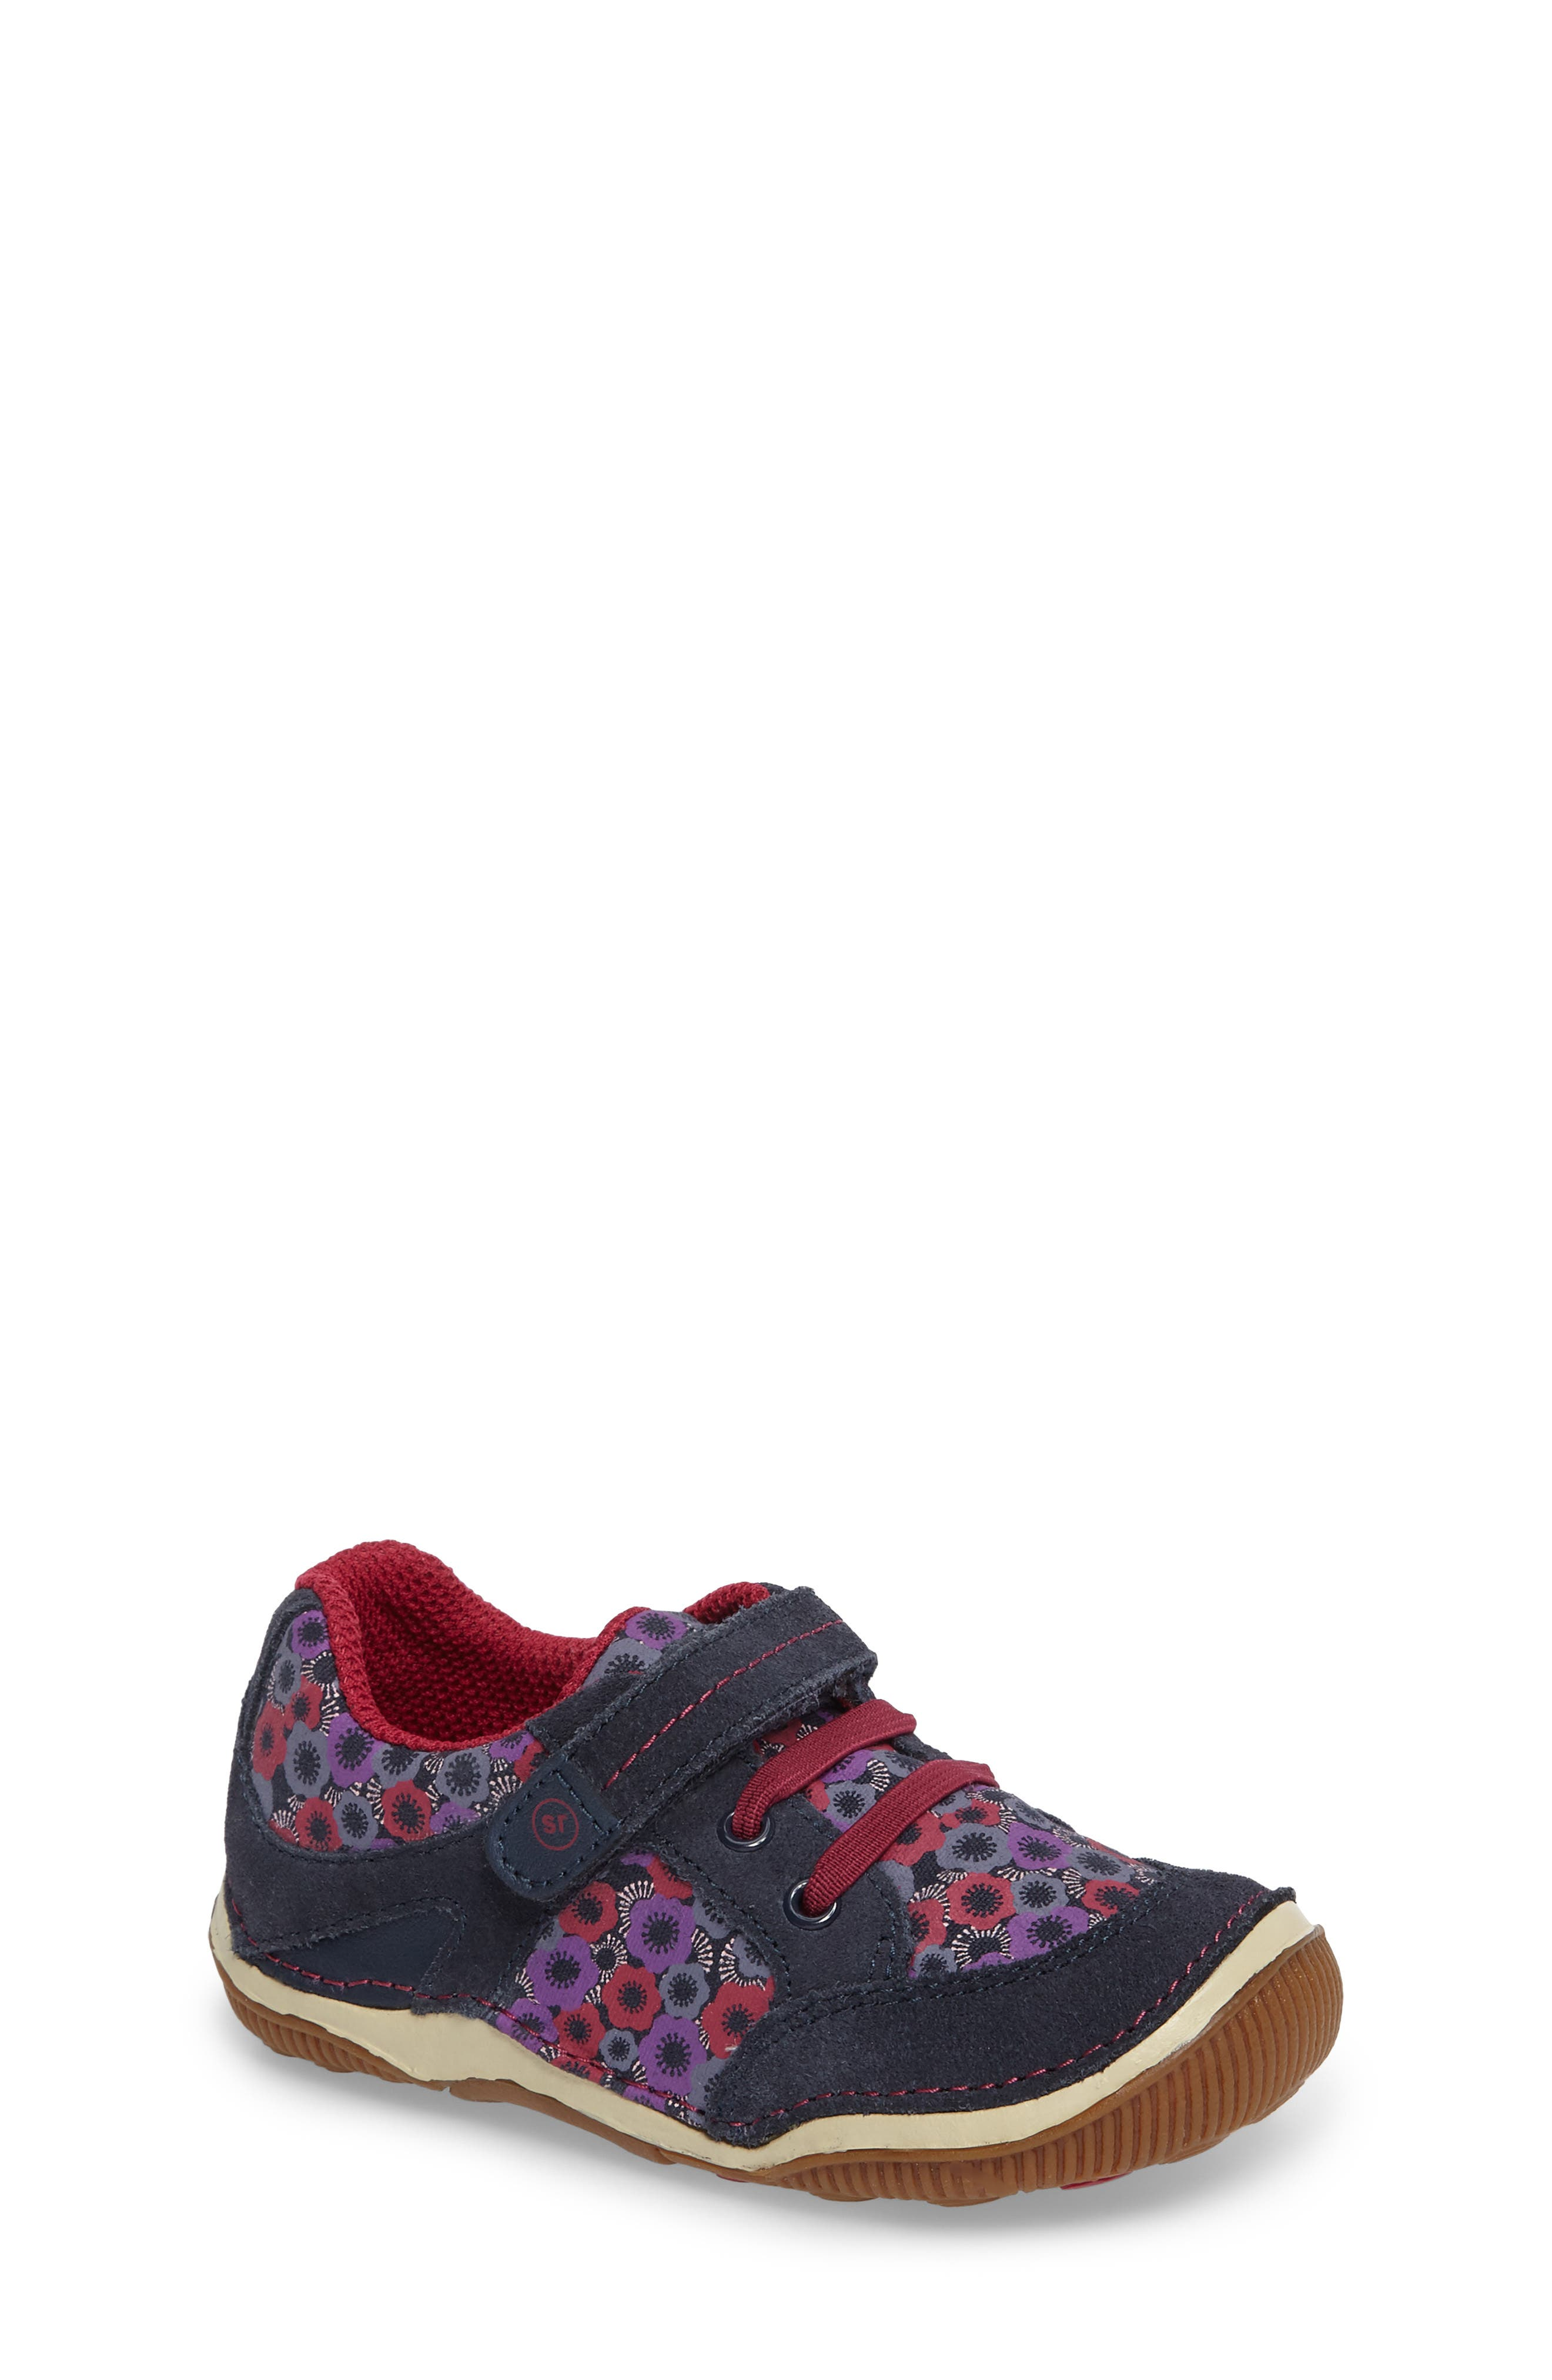 Armorie Flower Print Sneaker,                         Main,                         color, Navy